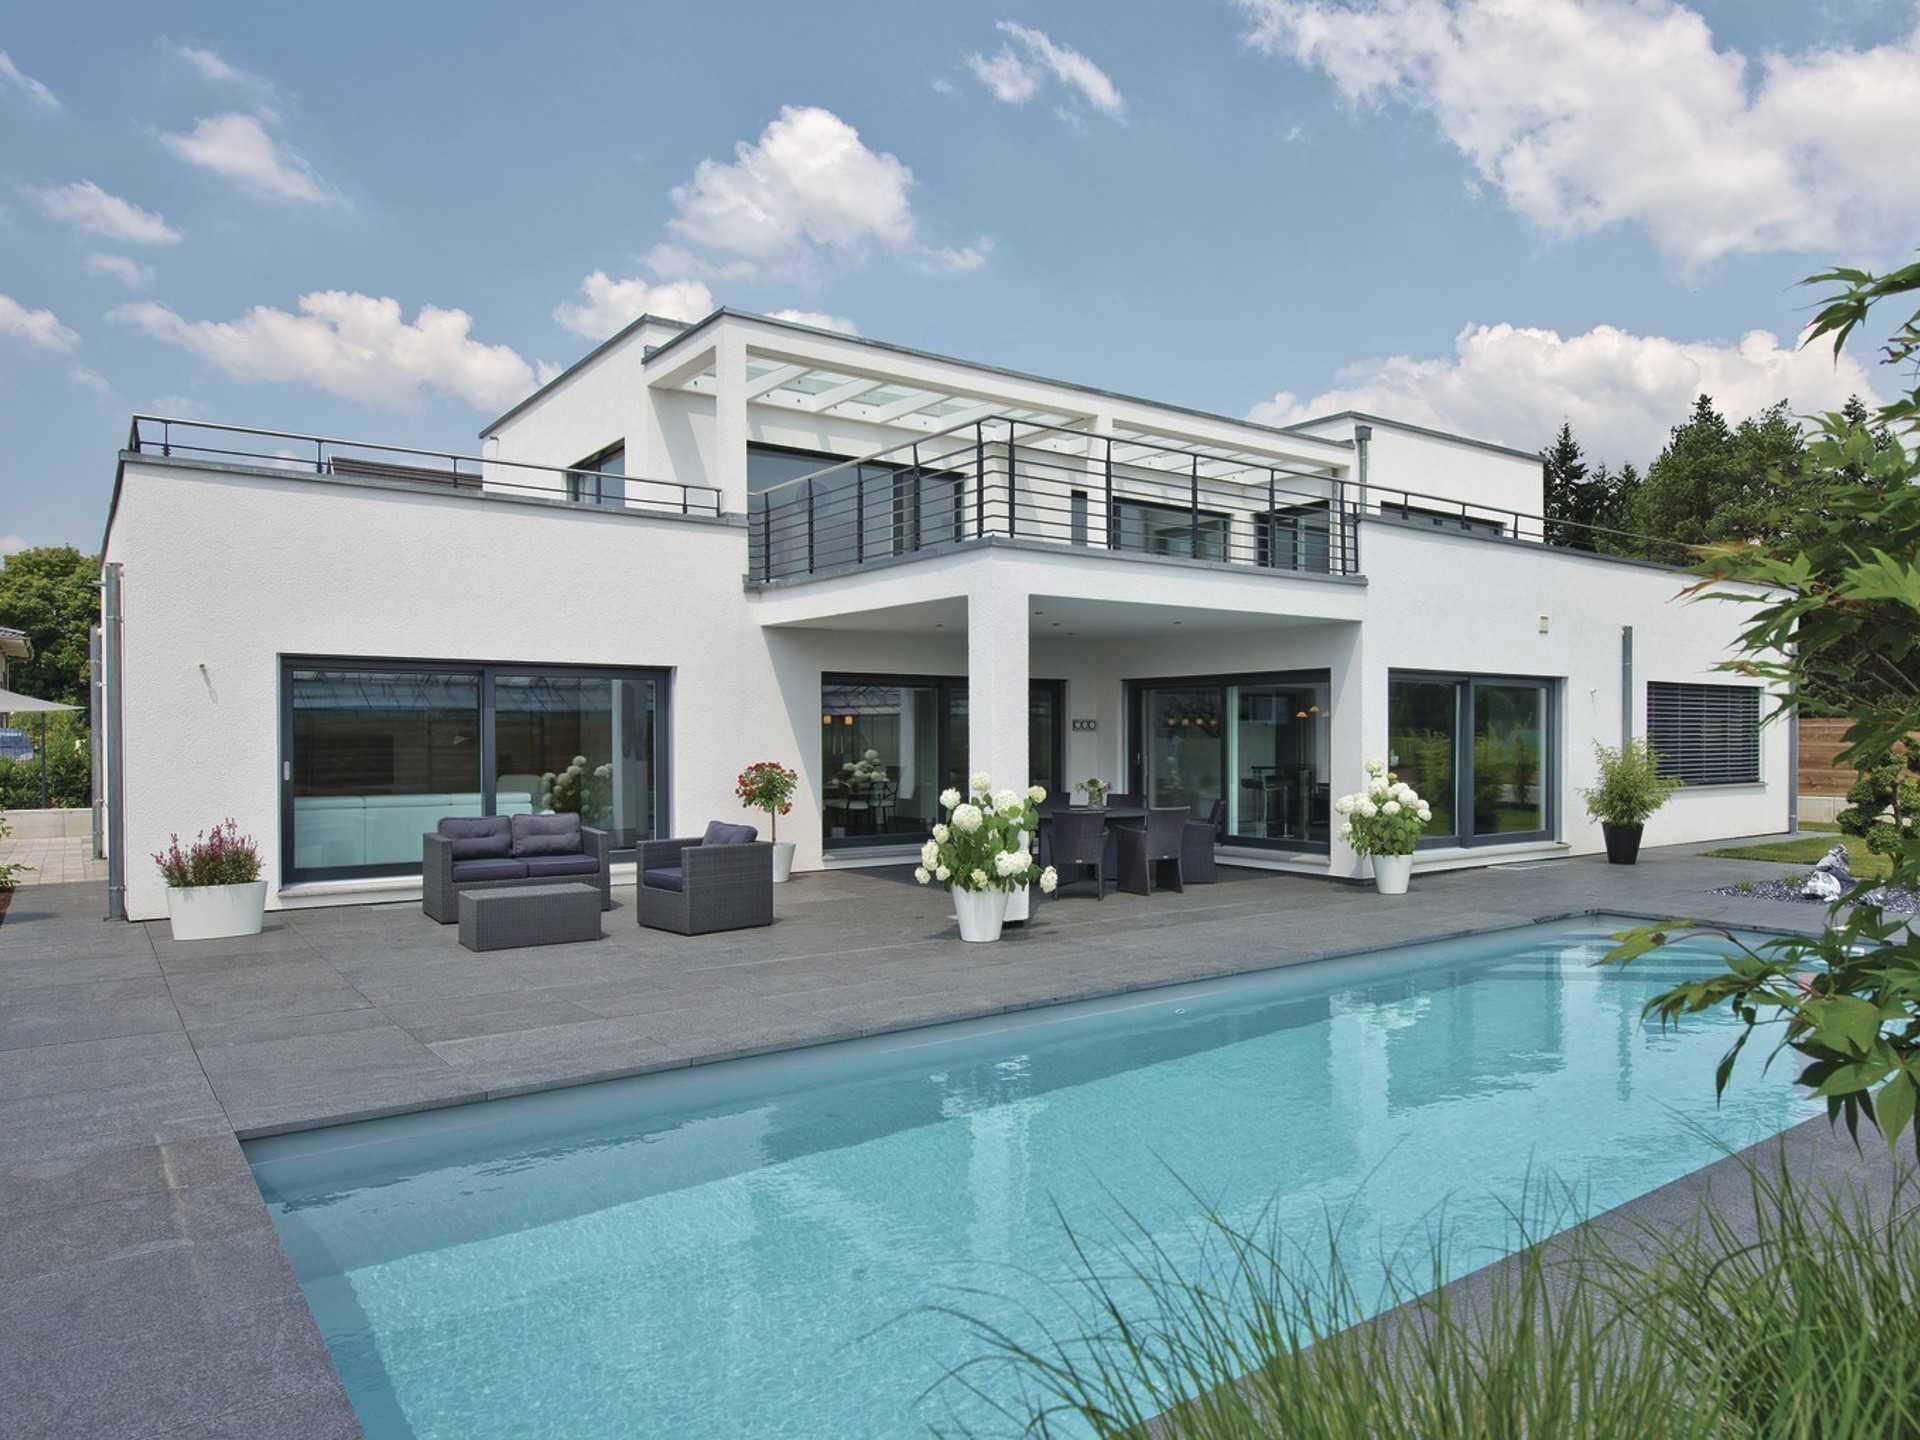 Luxusvilla im bauhaus stil weberhaus - Bauhaus pool zubehor ...